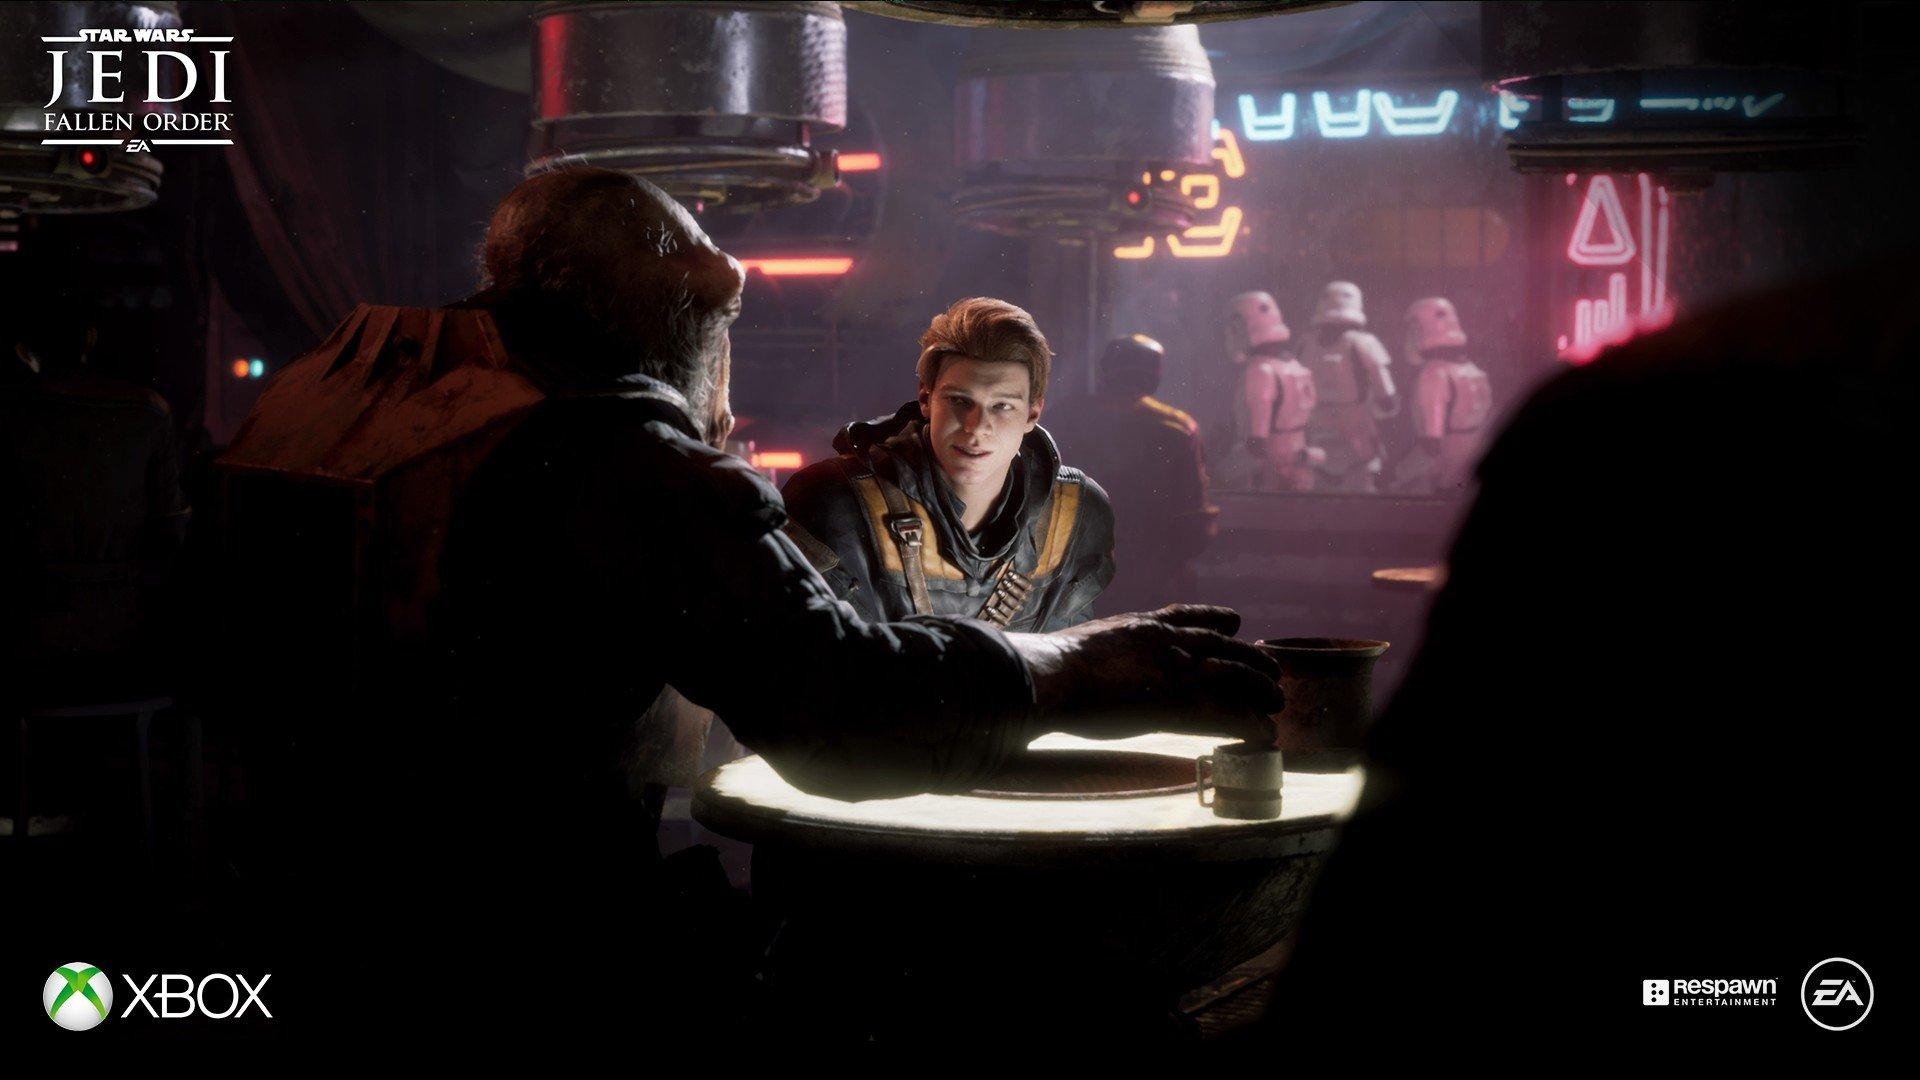 Voicing the role of Cere in Star Wars: Jedi Fallen order is actress Debra Wilson.